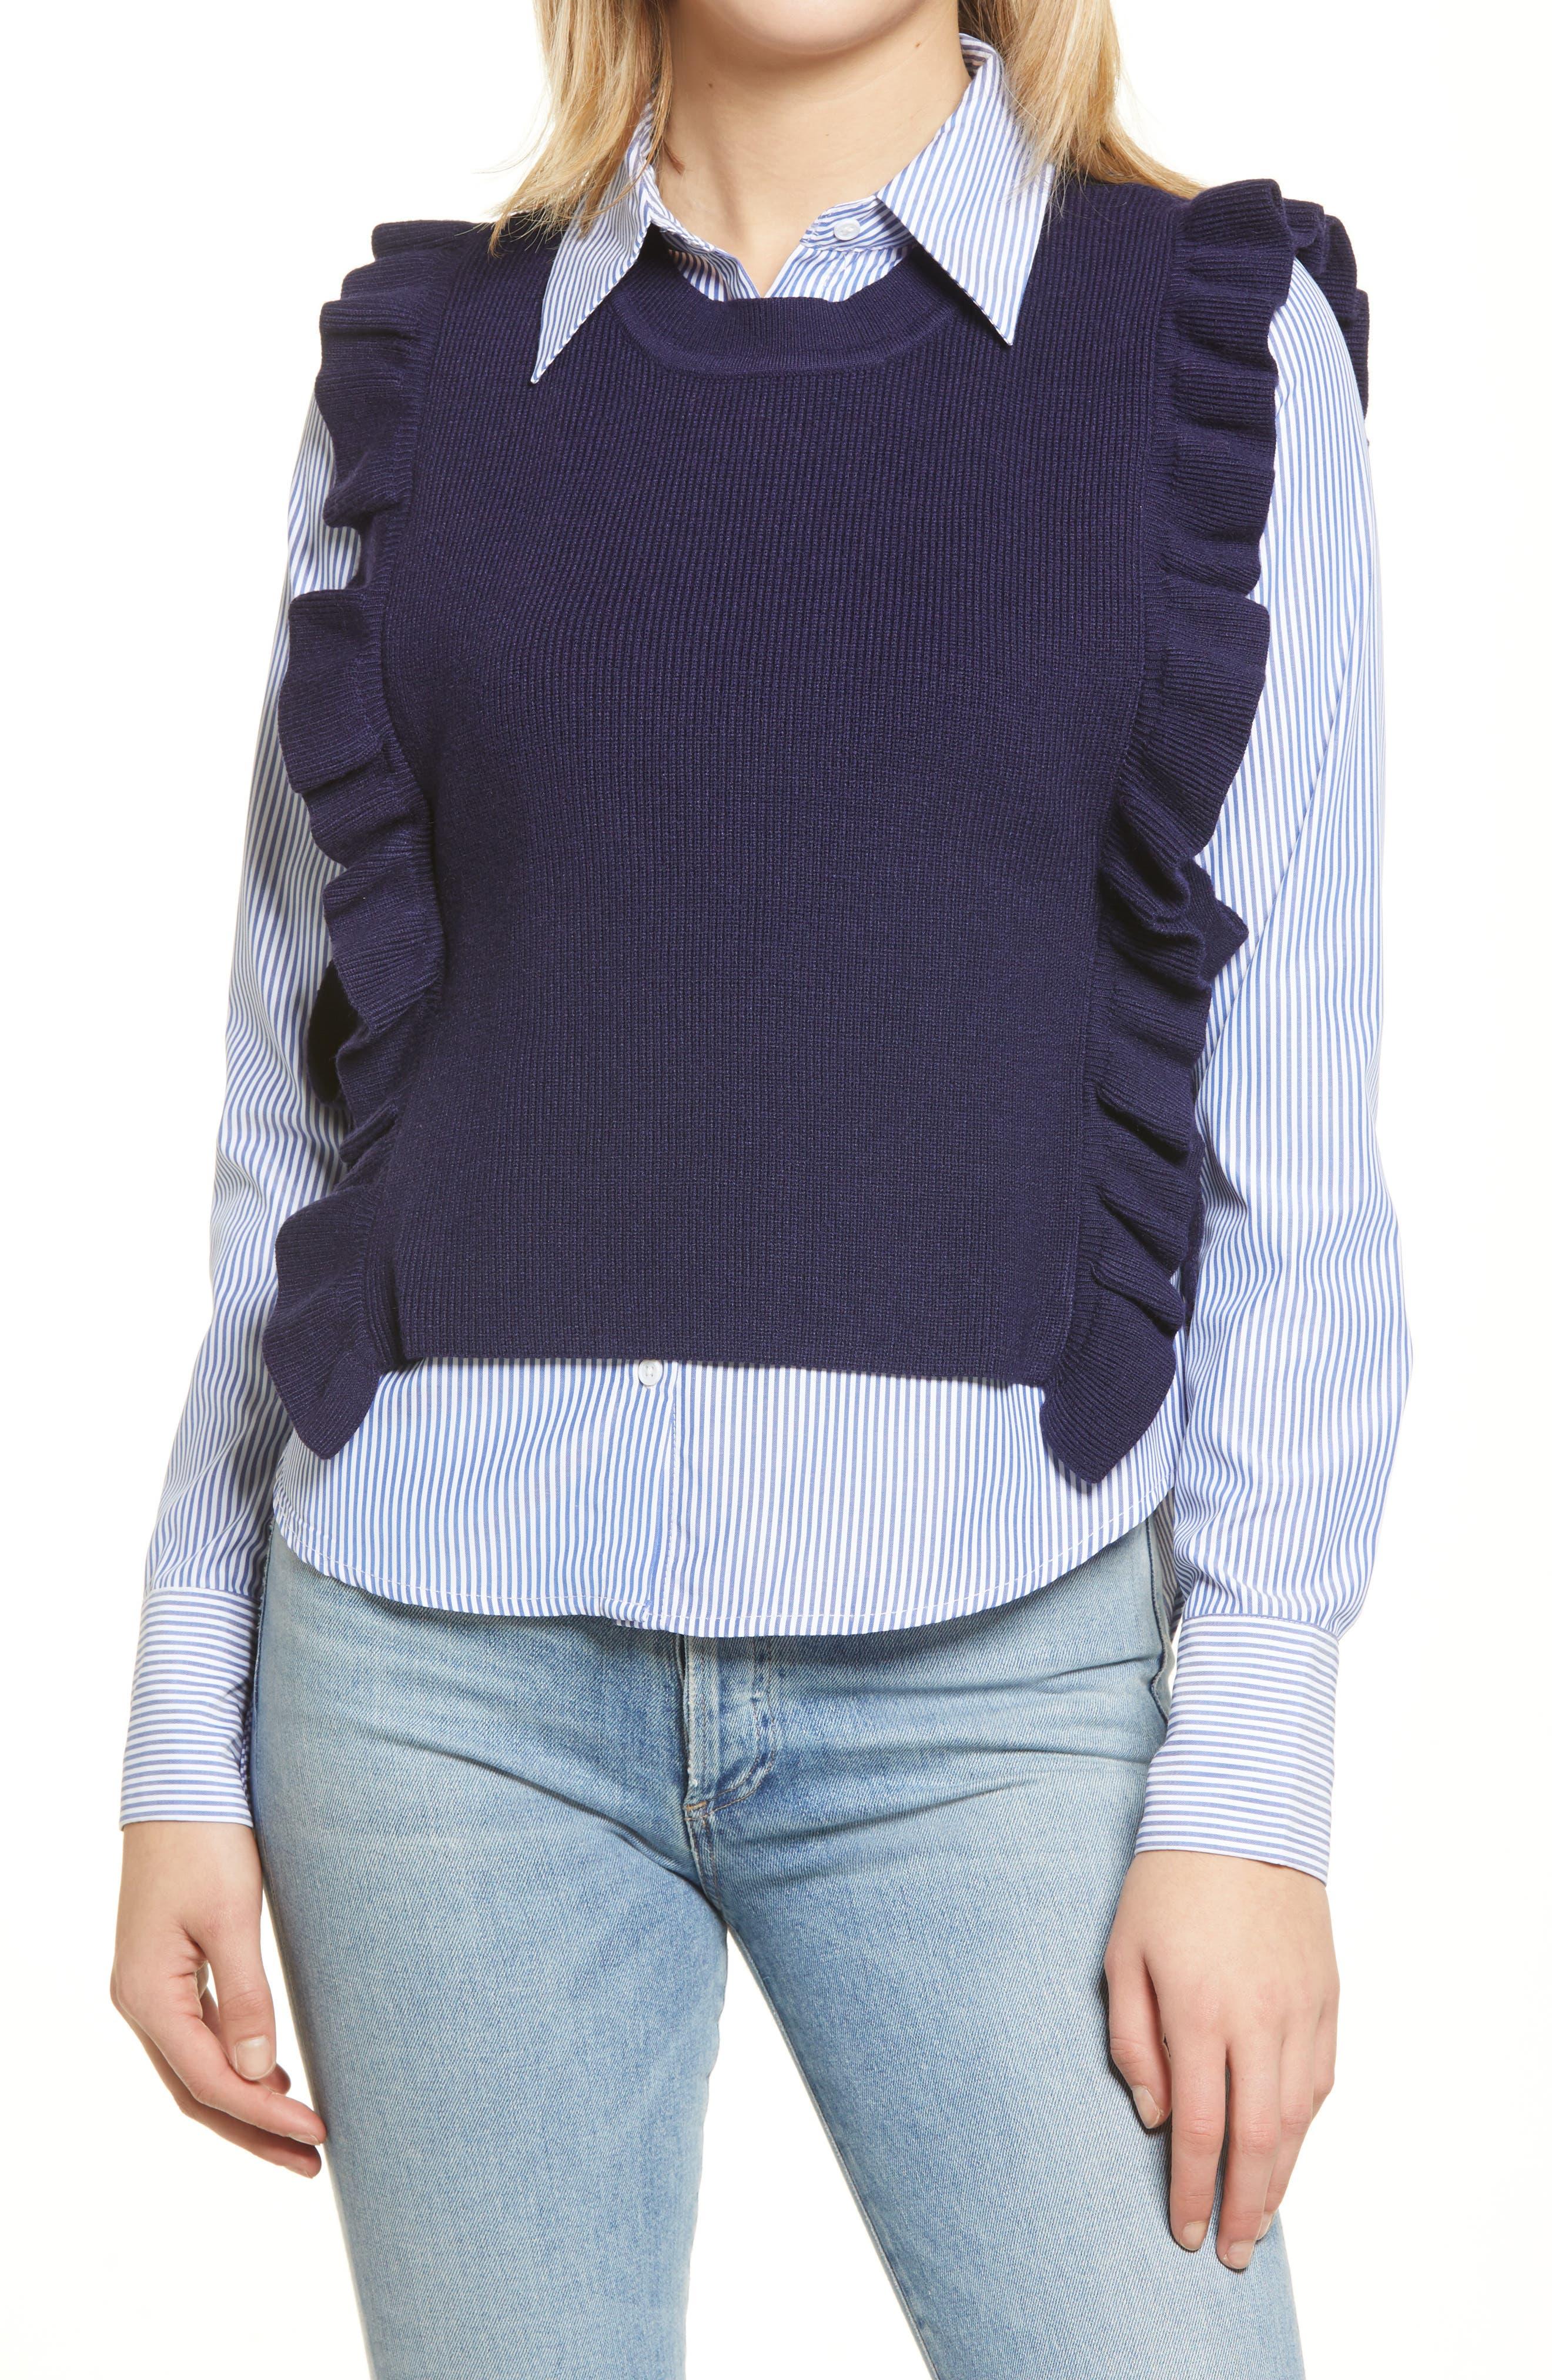 Combination Sweater Vest & Button-Up Shirt